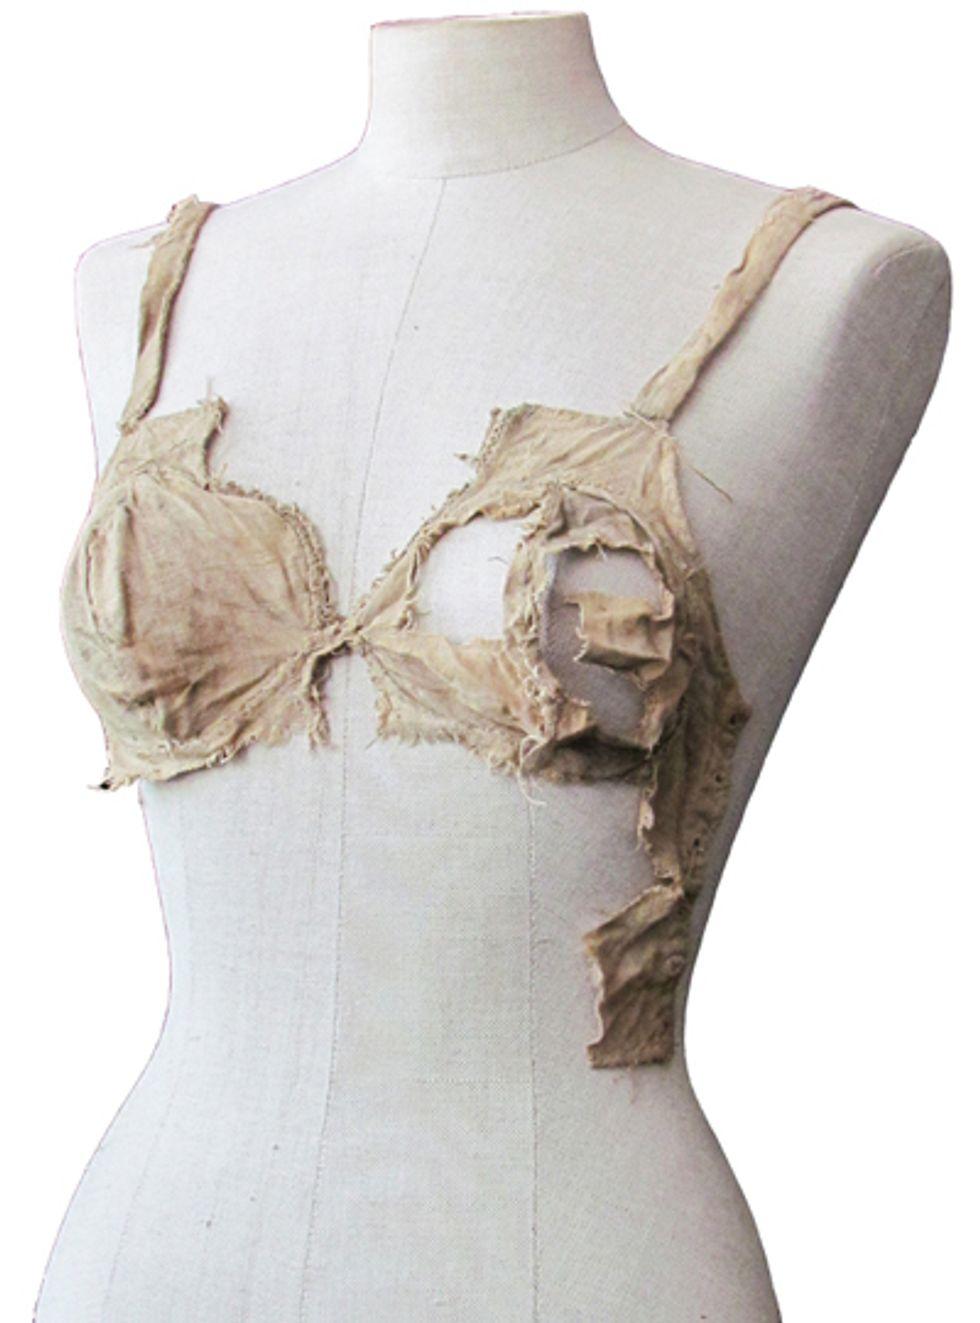 Style Scraps: The World's Oldest Bra + Richard Haines for Prada